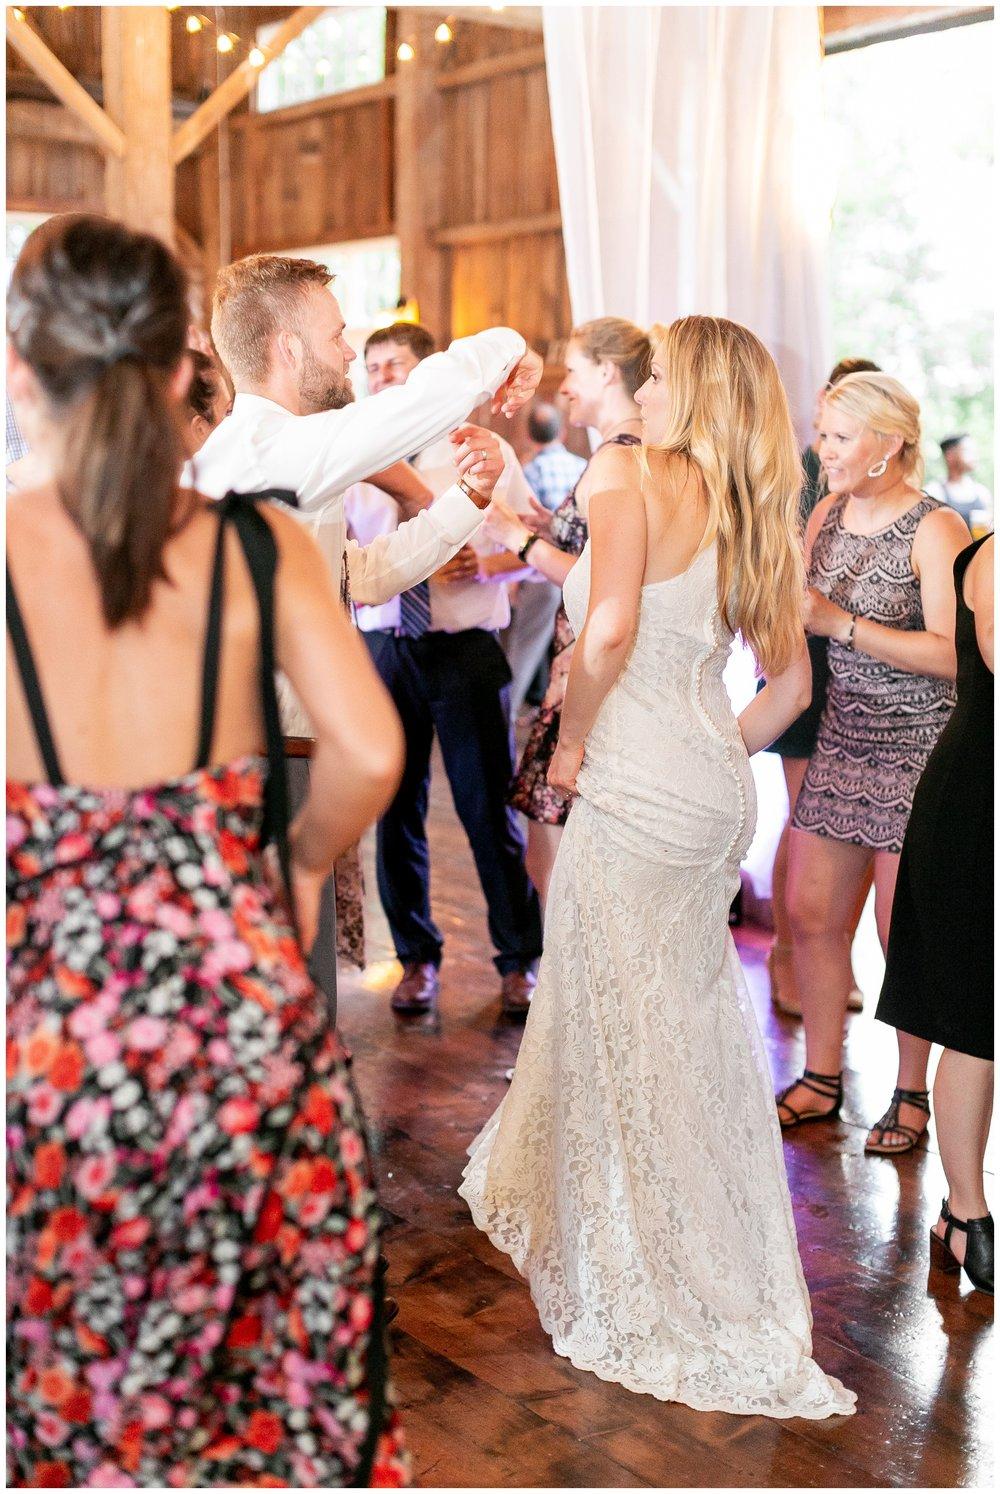 the_cupola_barn_wedding_delafield_resort_oconomowoc_wisconsin_0419.jpg